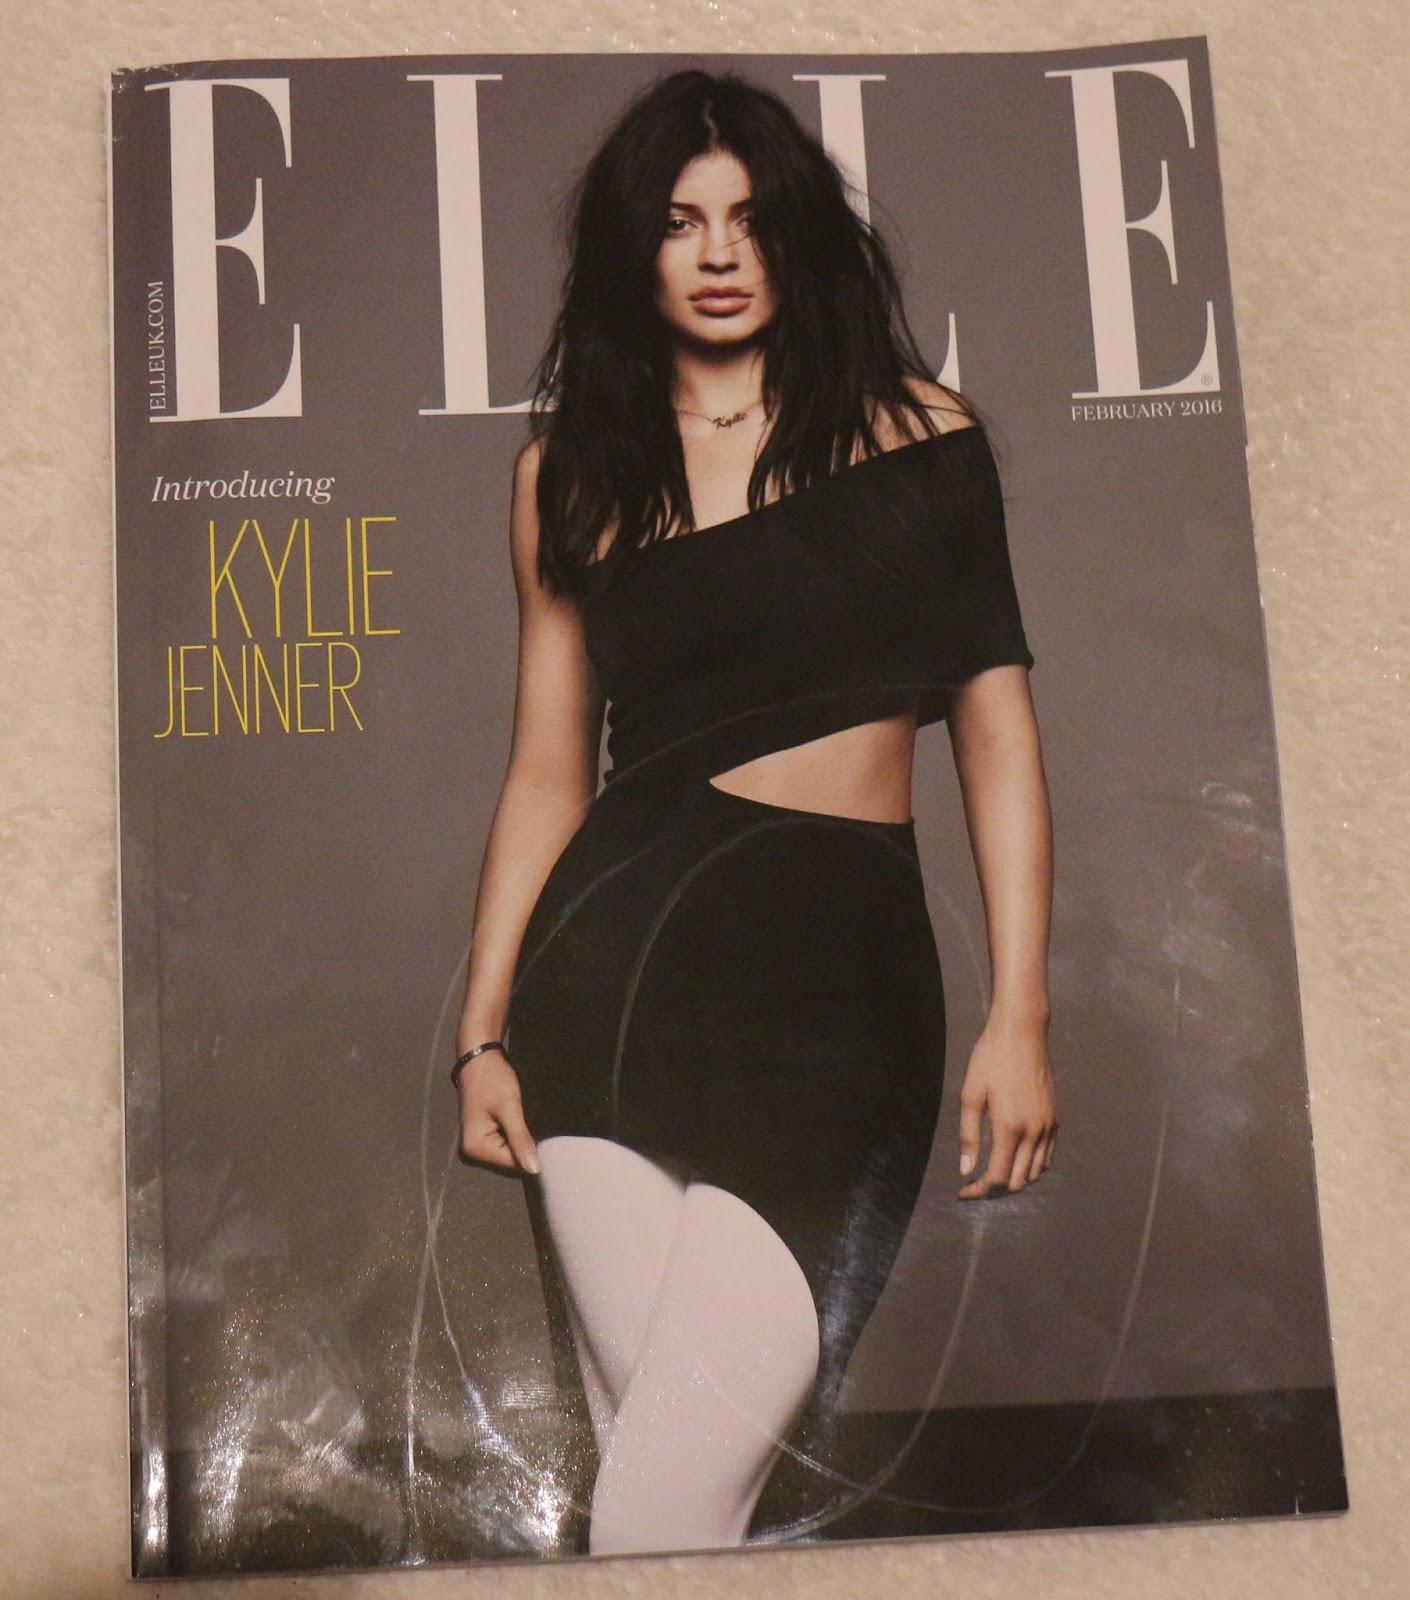 Next Generation // Kylie Jenner ELLE's February 2016 Cover Star